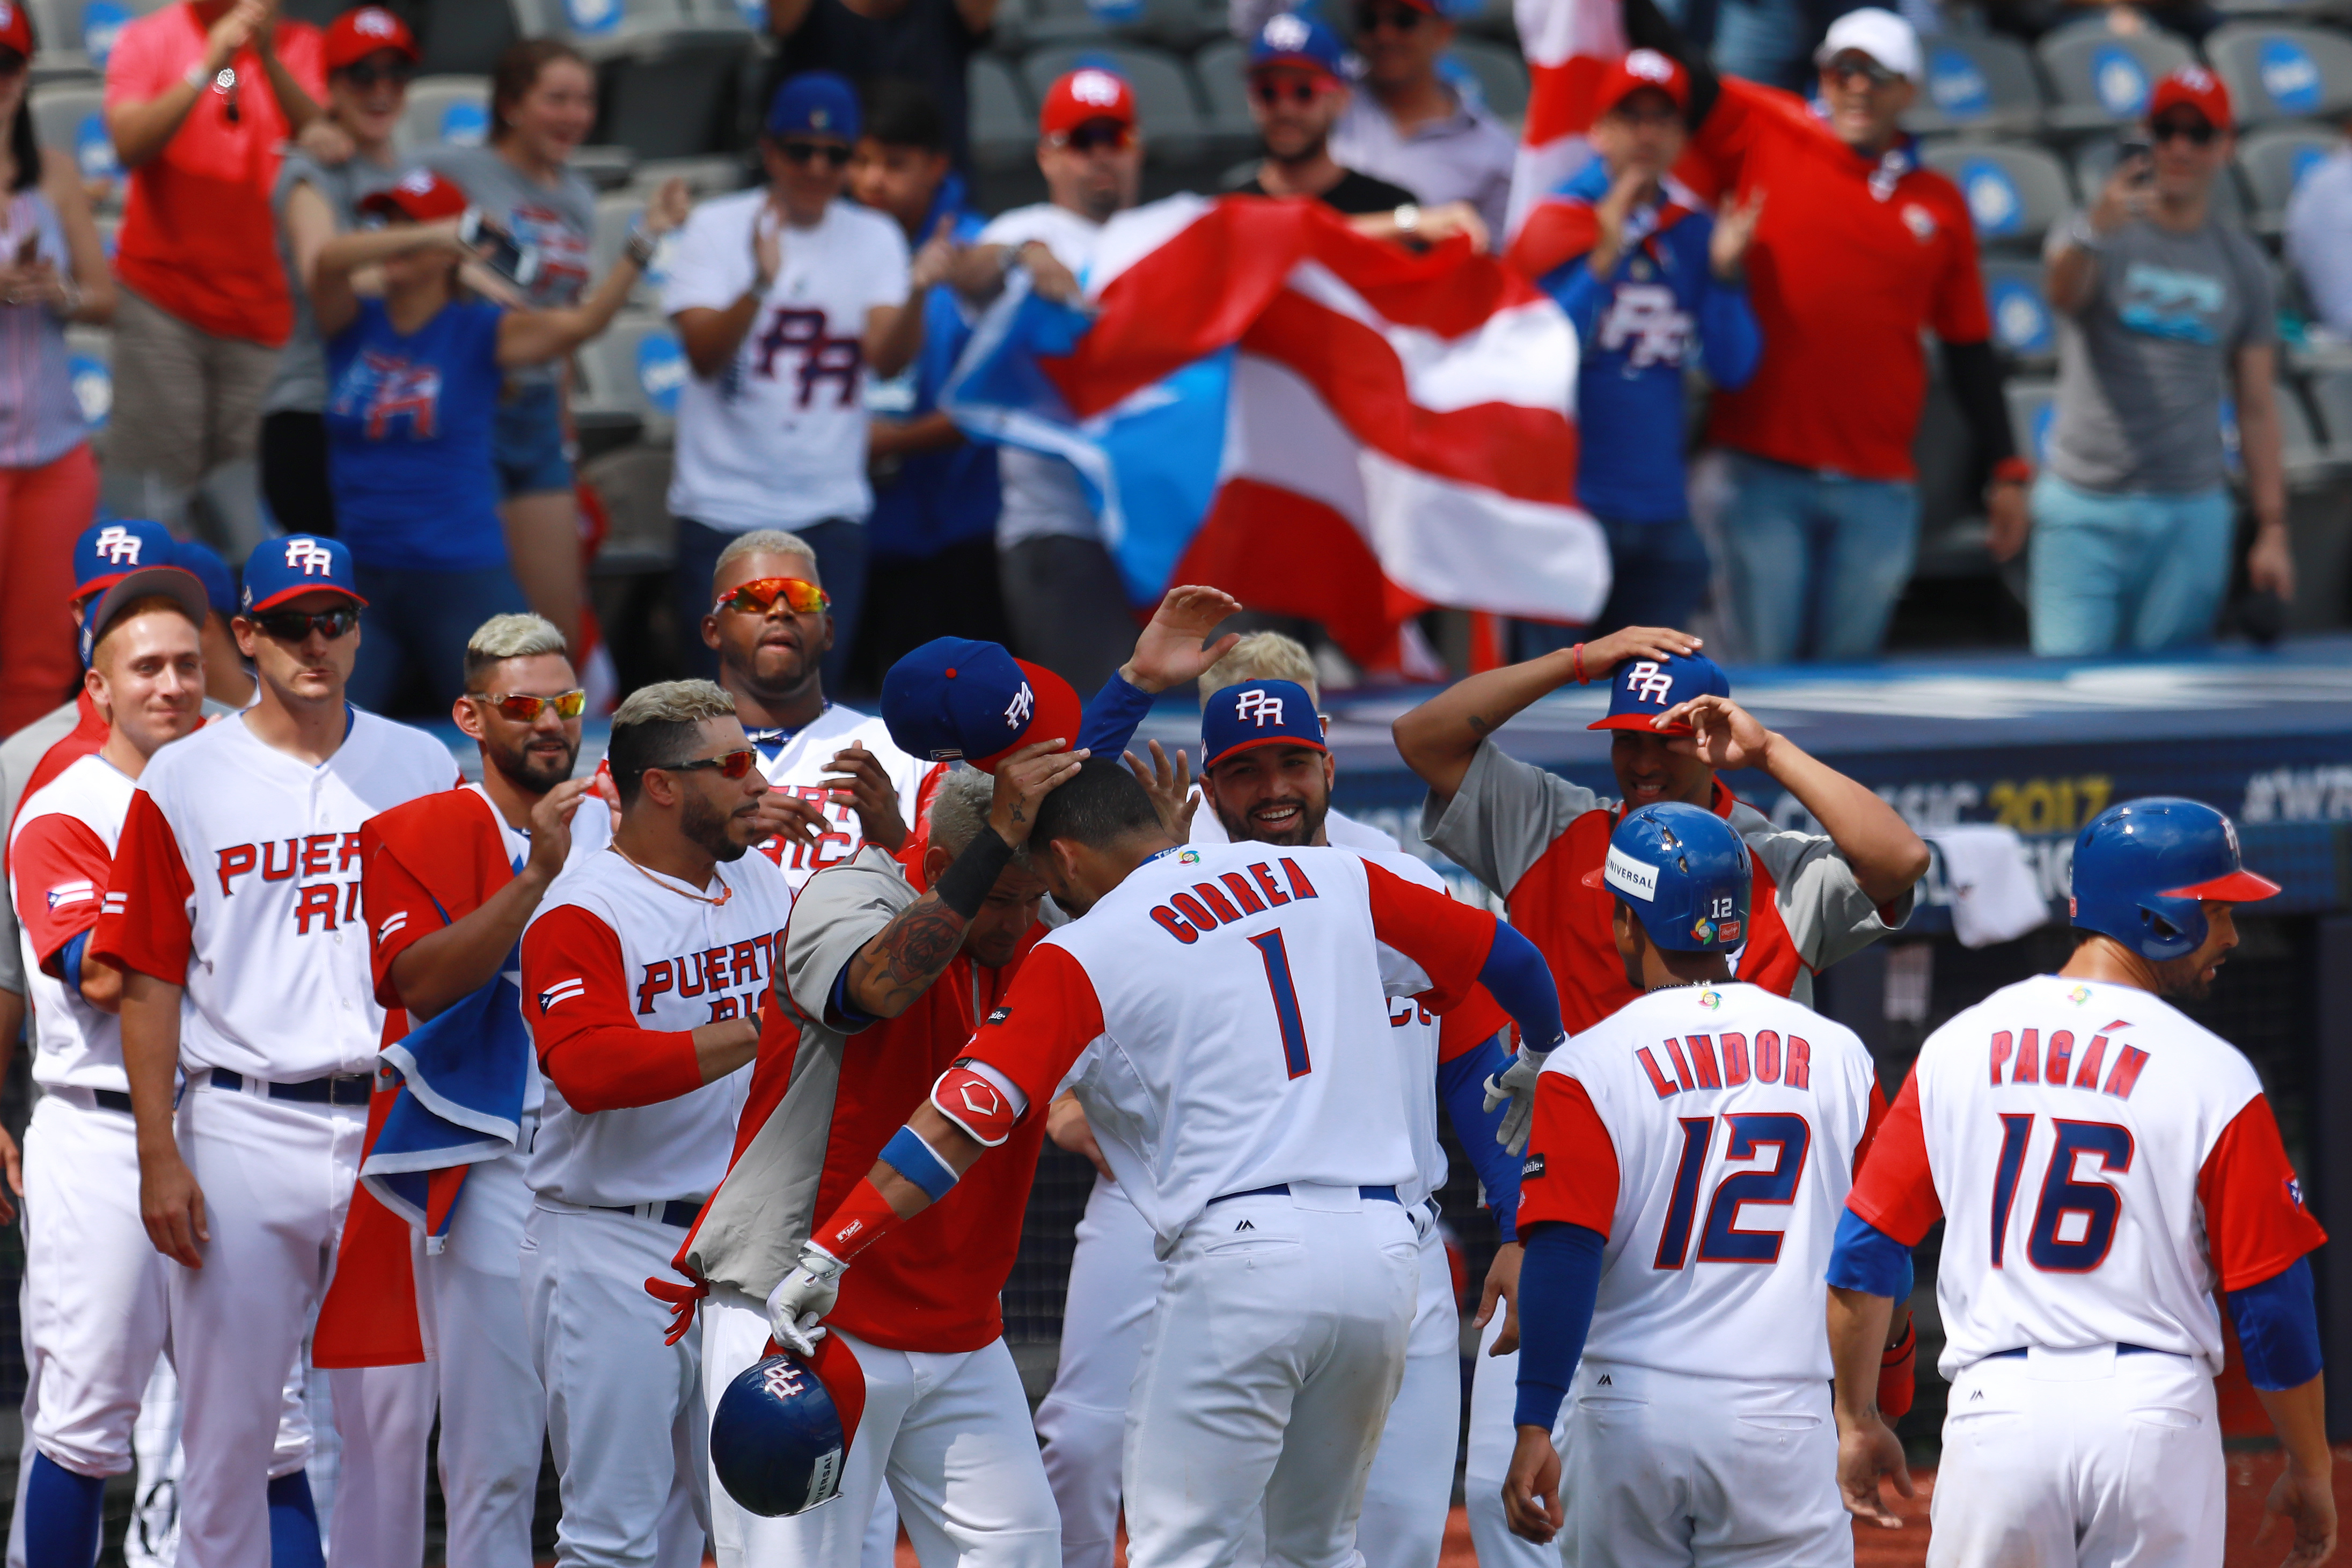 World Baseball Classic - Pool D - Game 5 - Italy v Puerto Rico